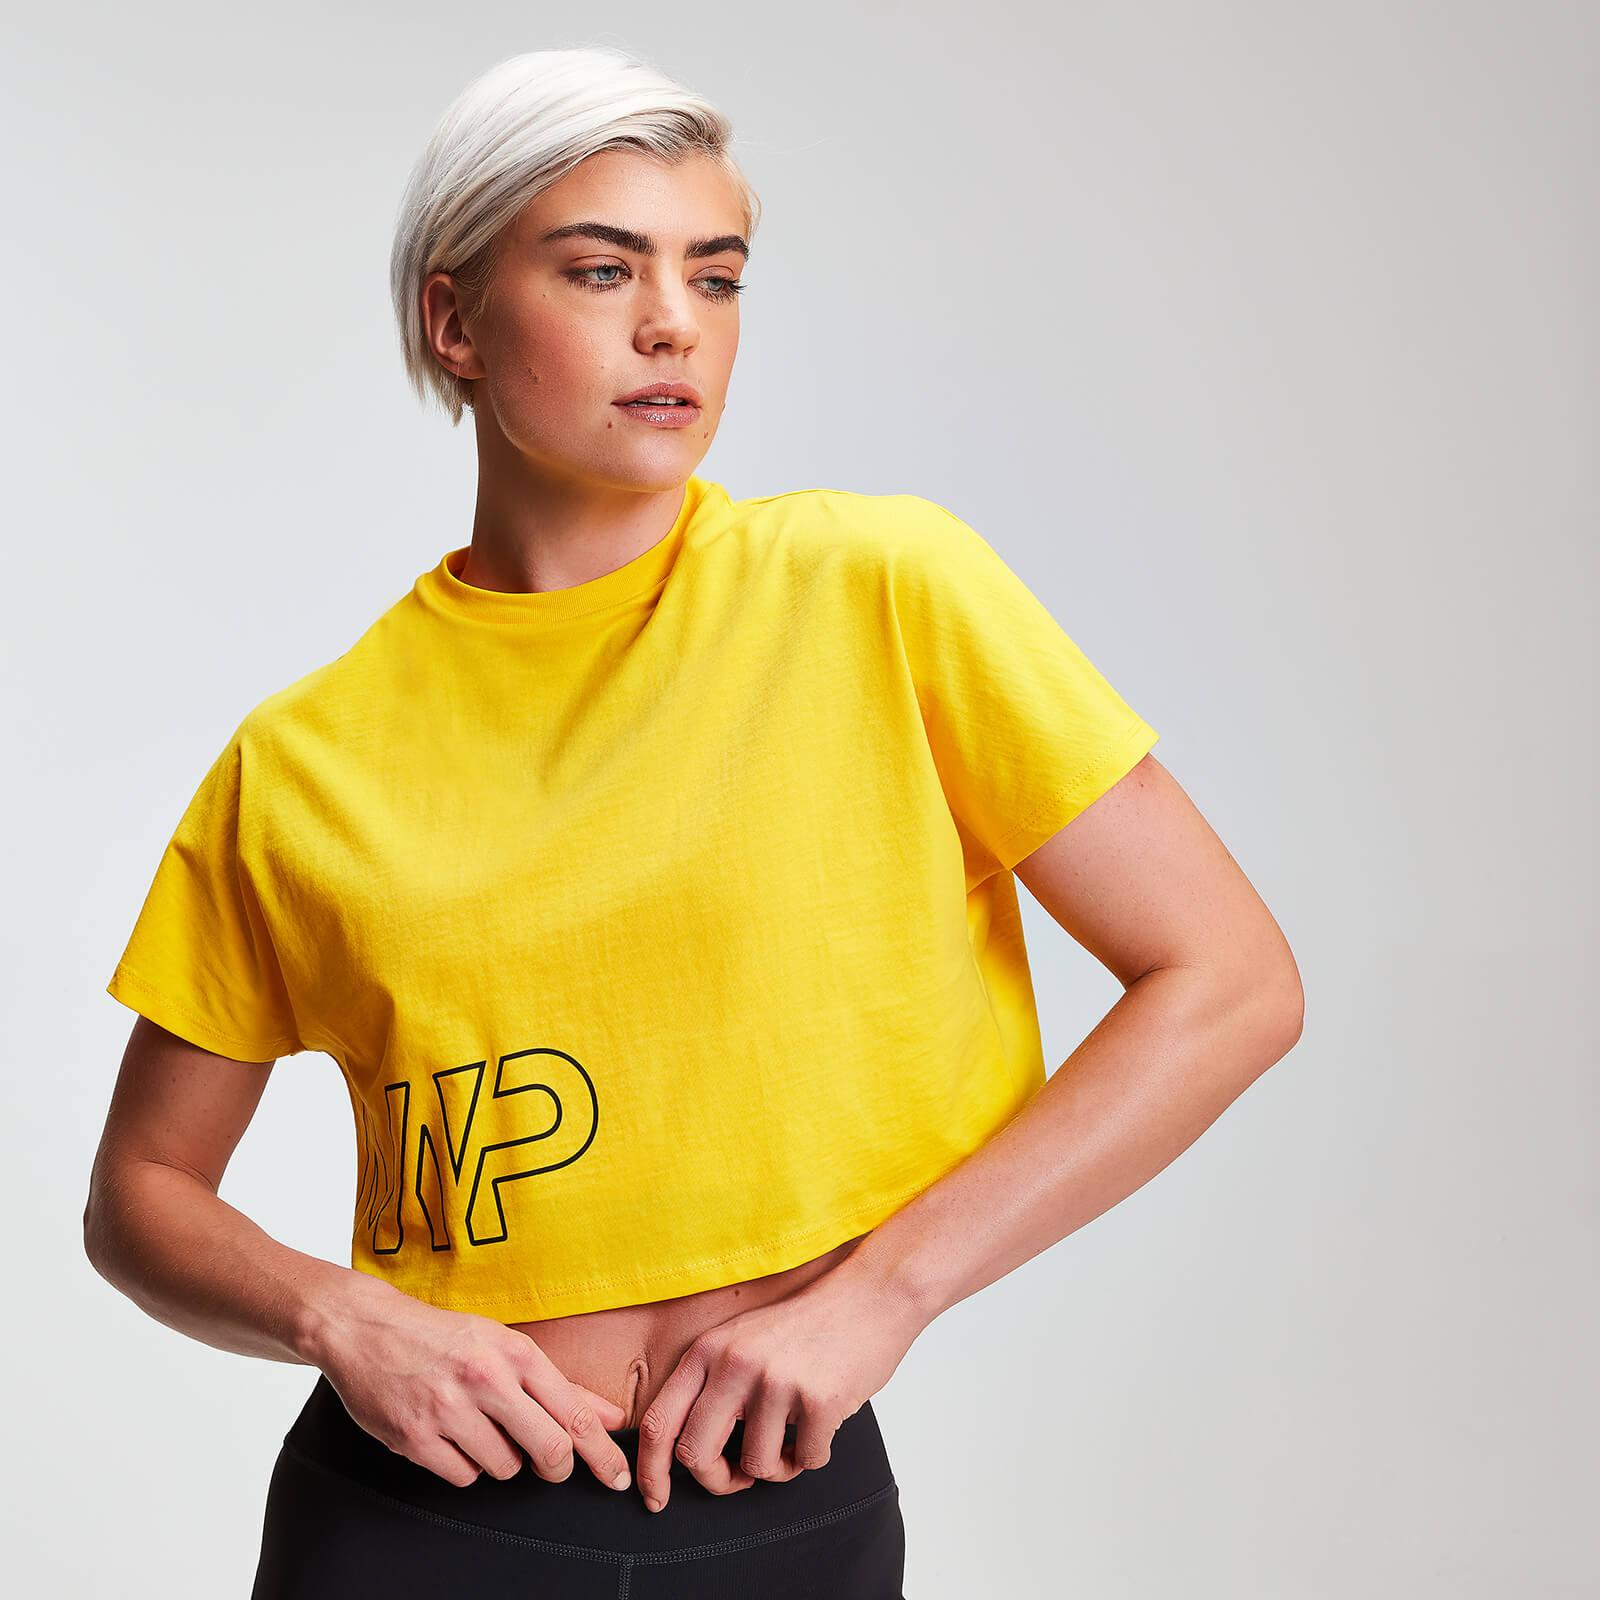 Myprotein Naisten MP Power Cropped T-Paita - Buttercup - S